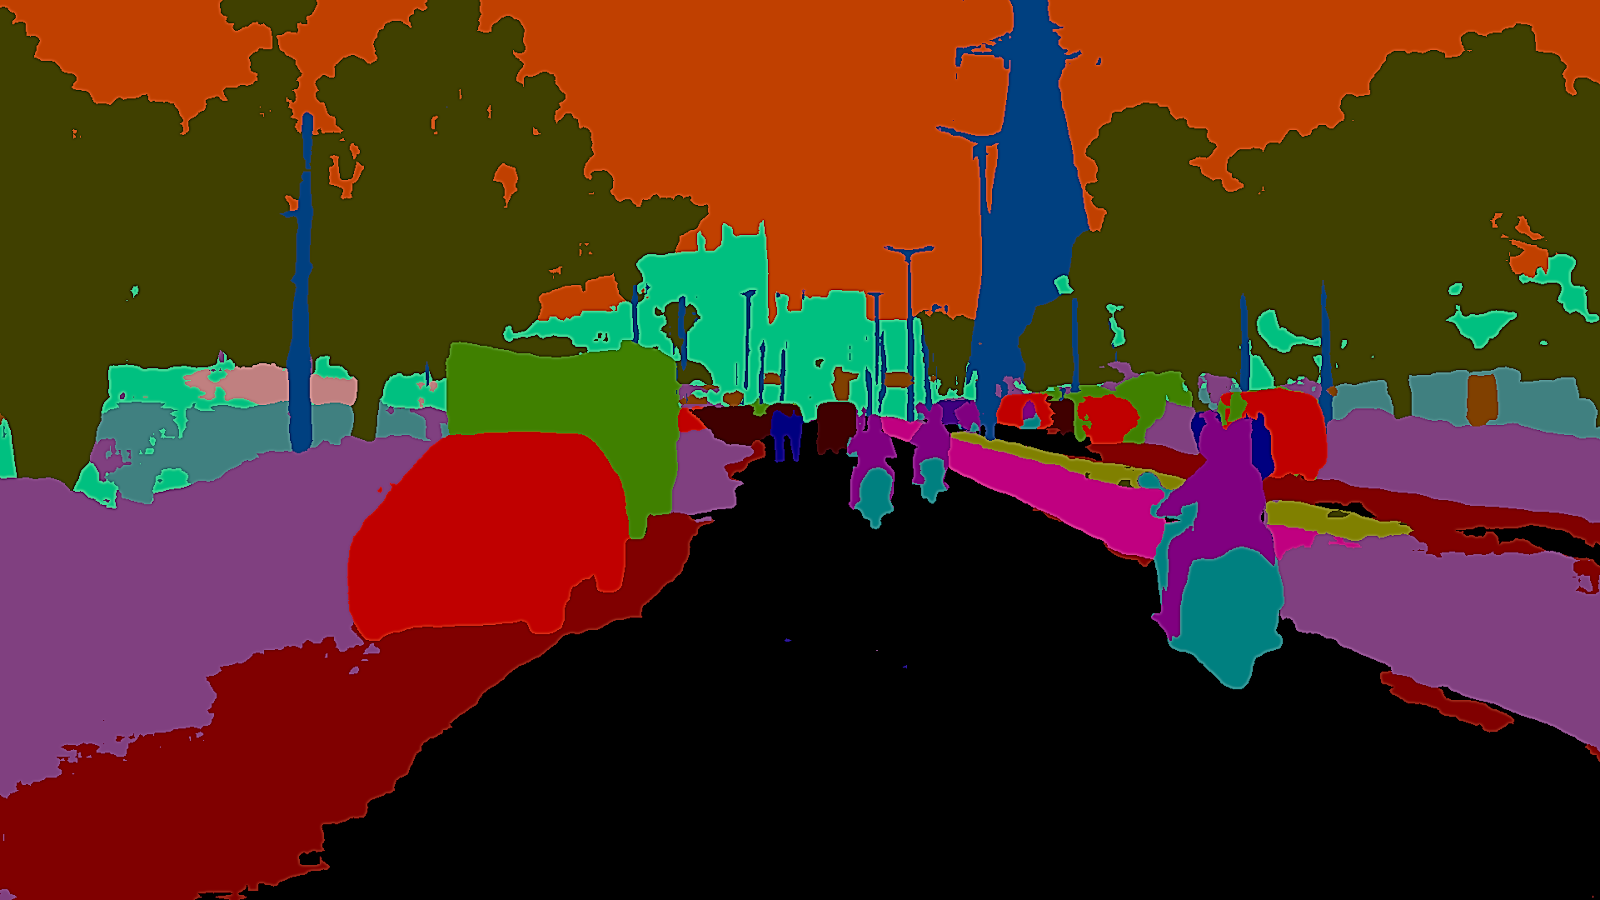 Semantic Segmentation on Road